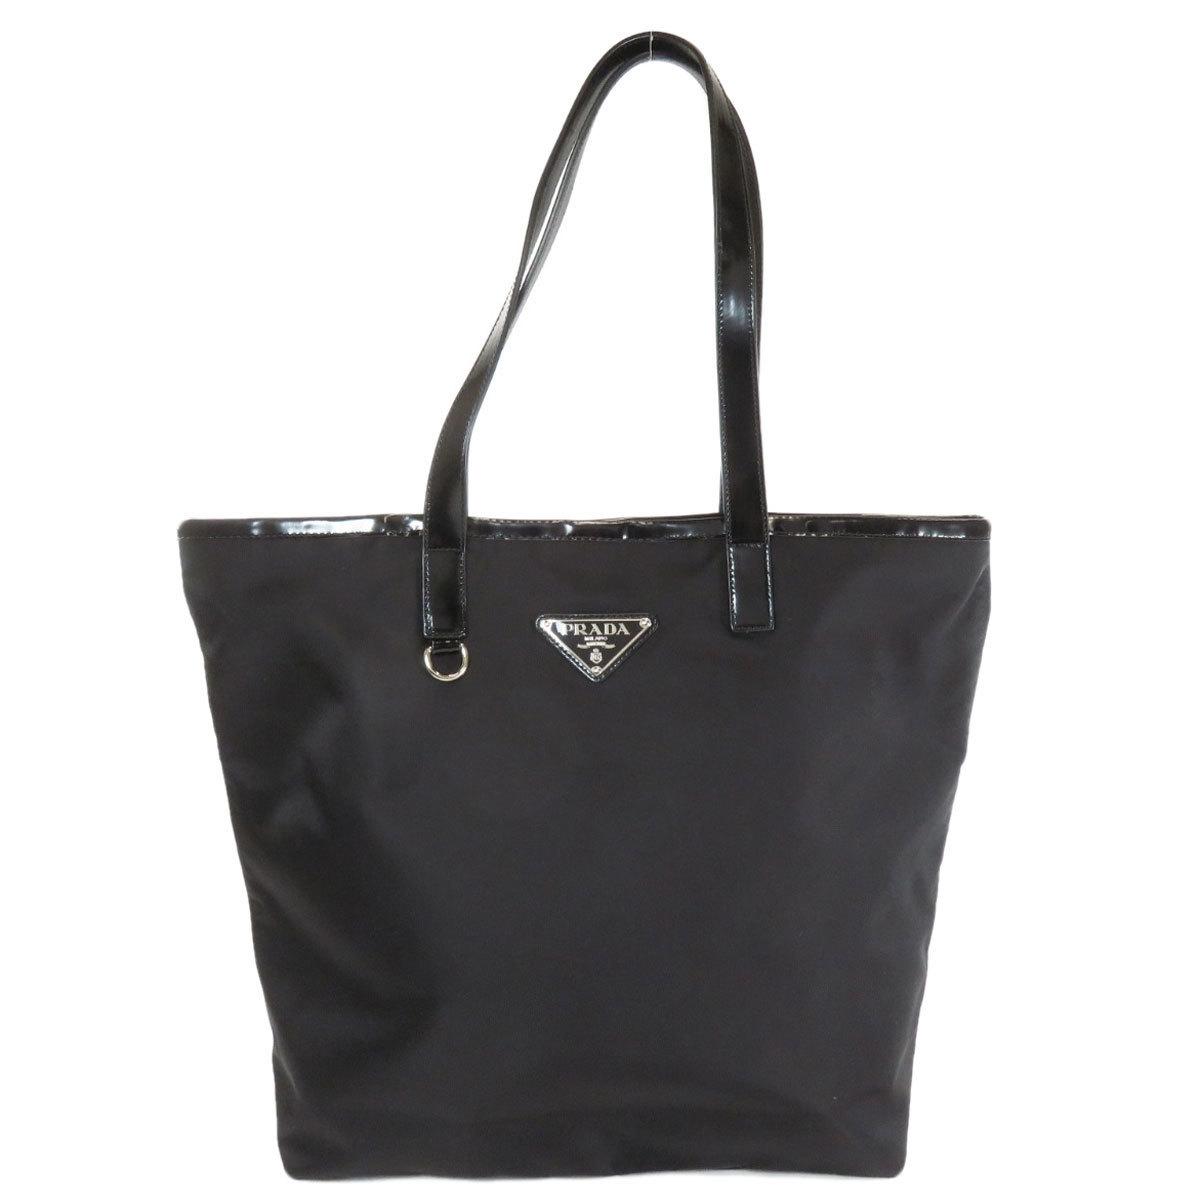 Prada Logo Motif Tote Bag Nylon Leather Ladies